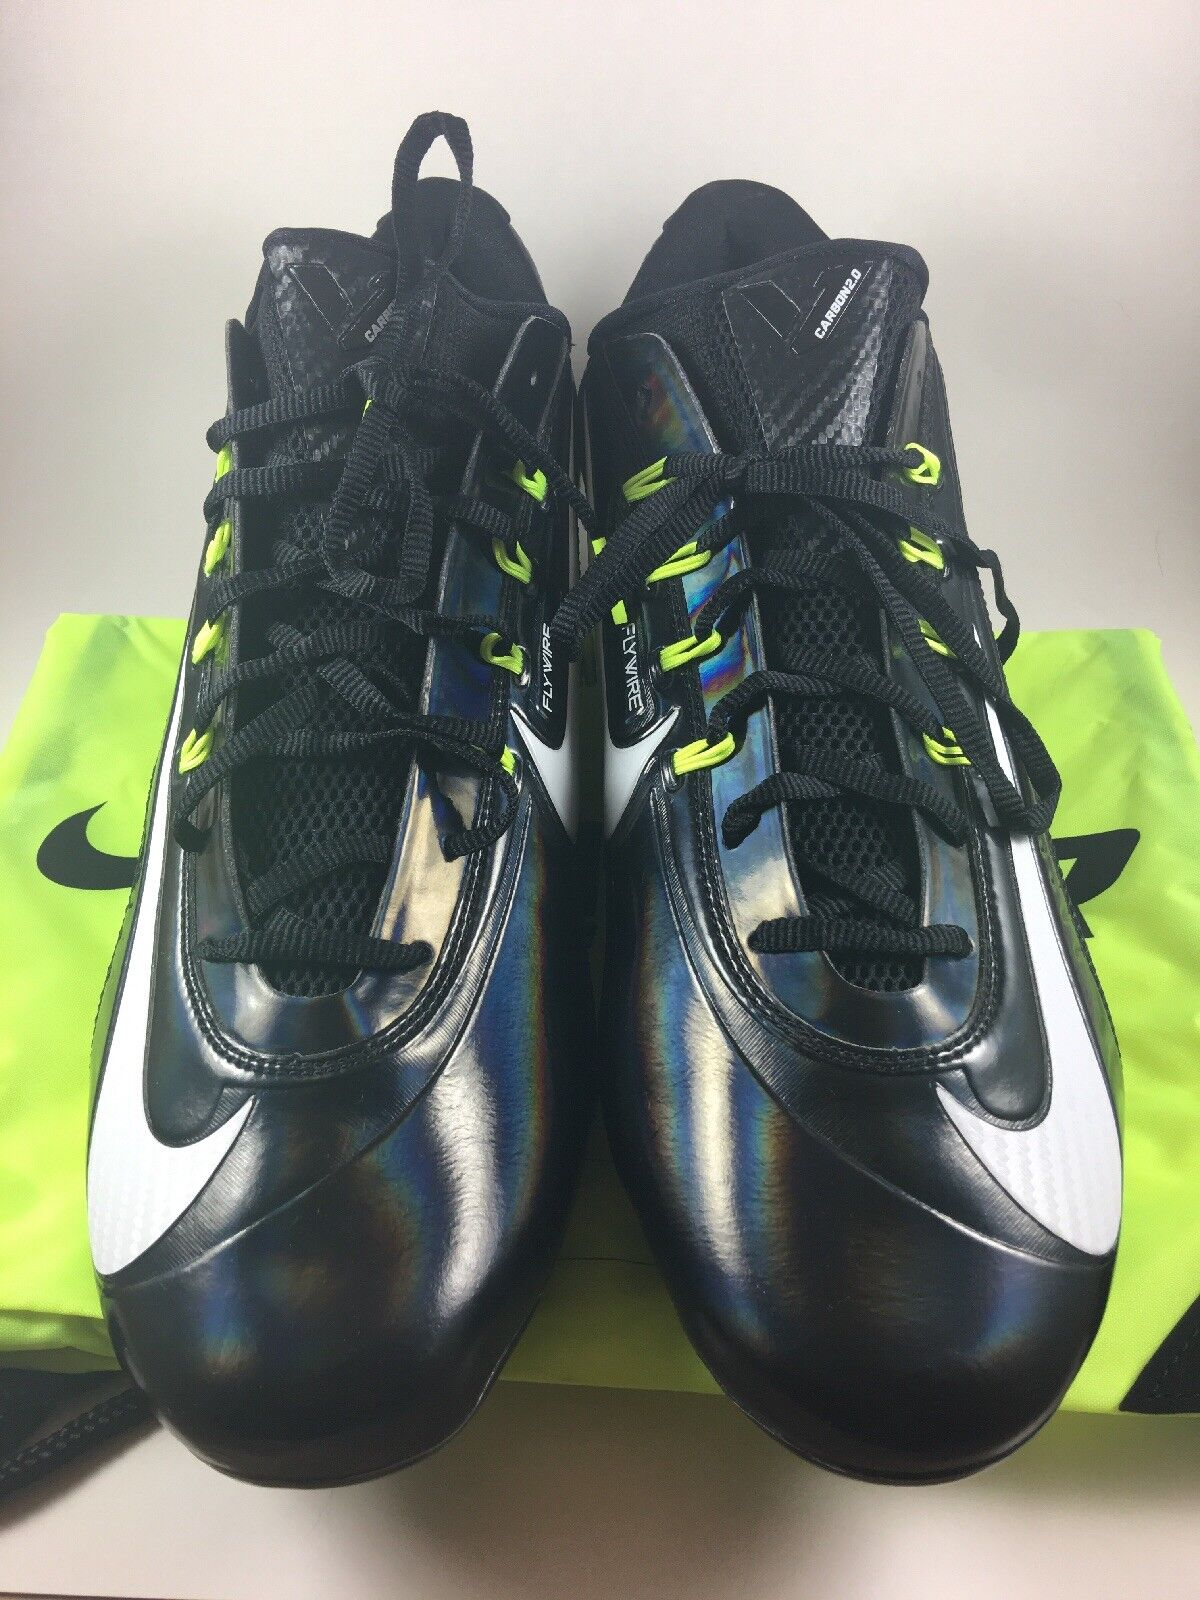 Sz 16 Nike Vapor Carbon Cleats 2.0 Elite TD Football Cleats Carbon Triple Black White 7bf938